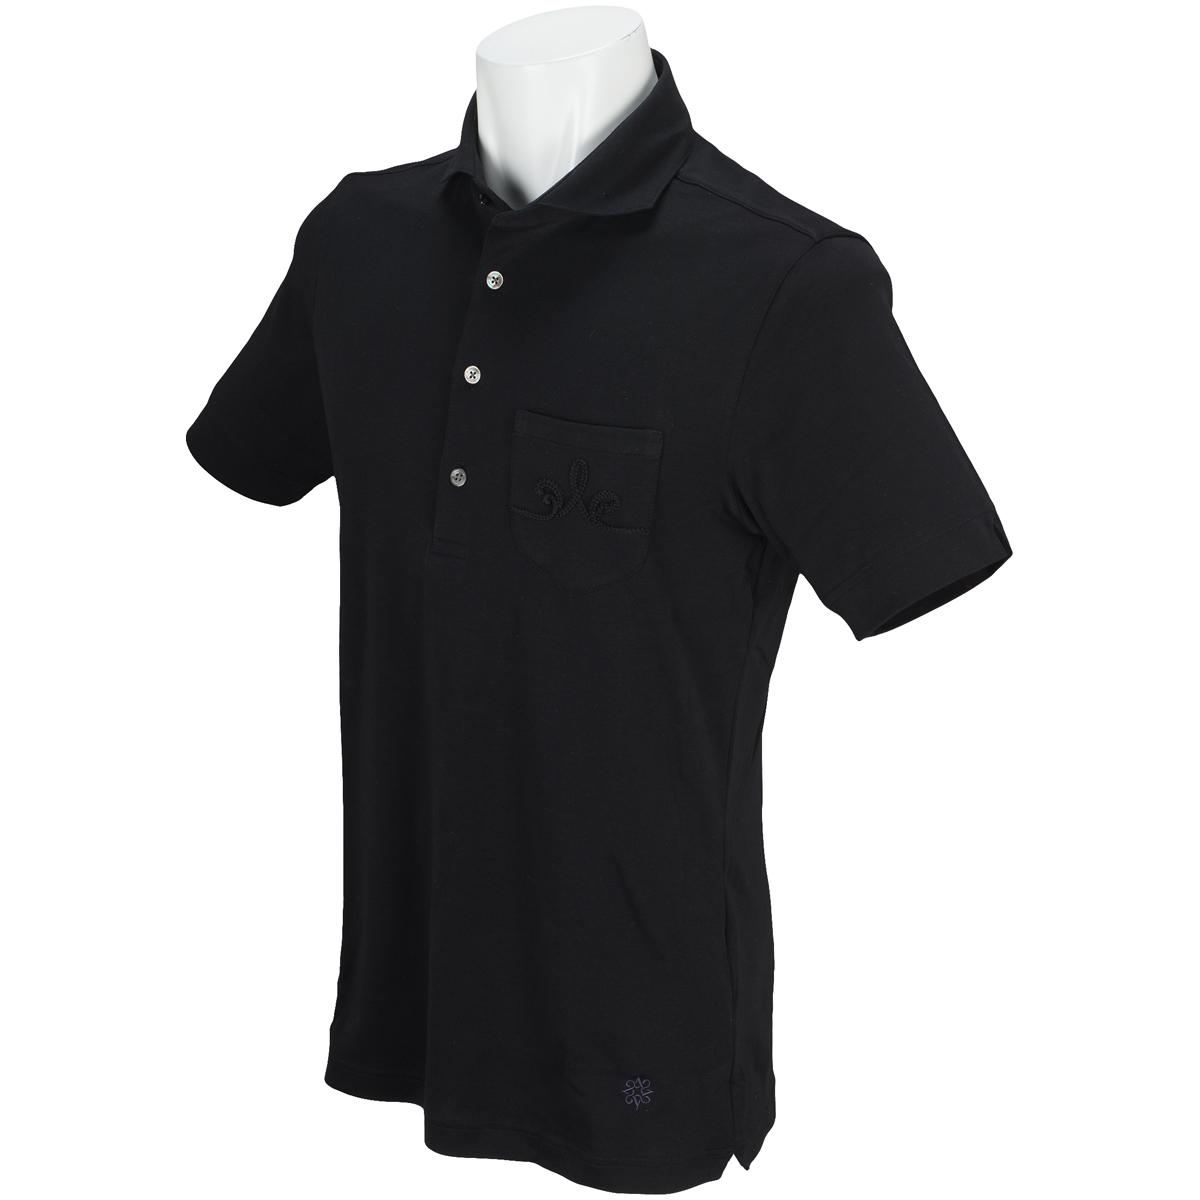 BLKスムースコード刺繍半袖ポロシャツ